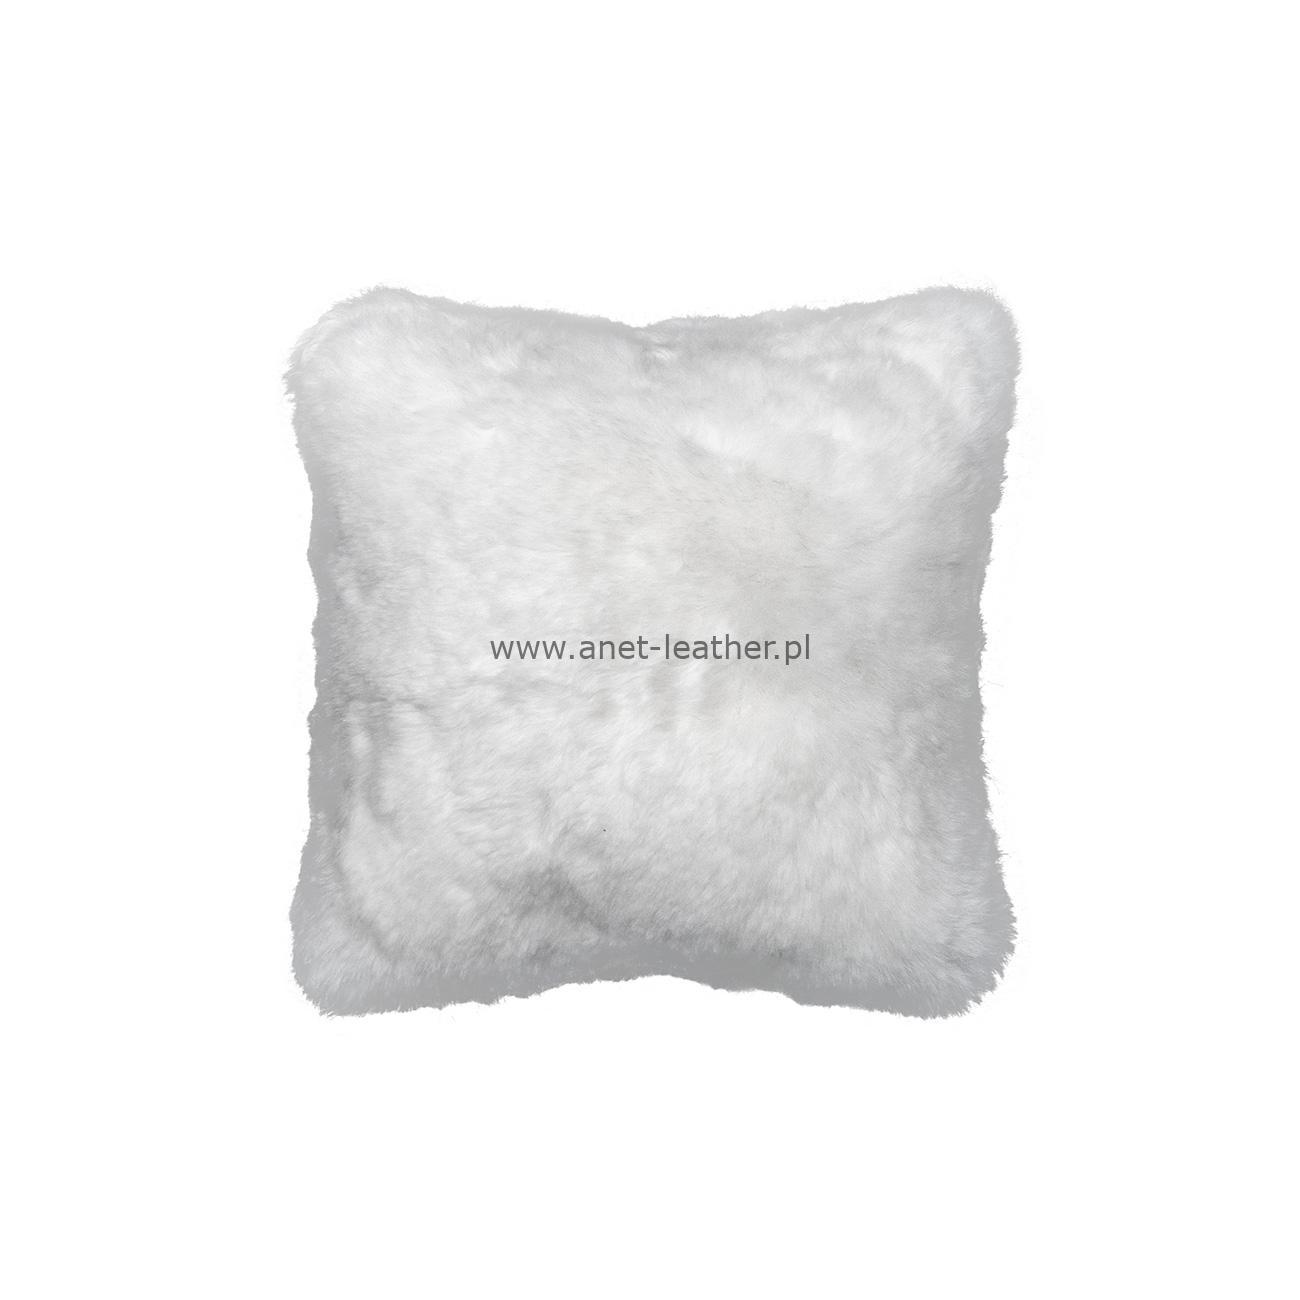 NATURAL WHITE SHORN